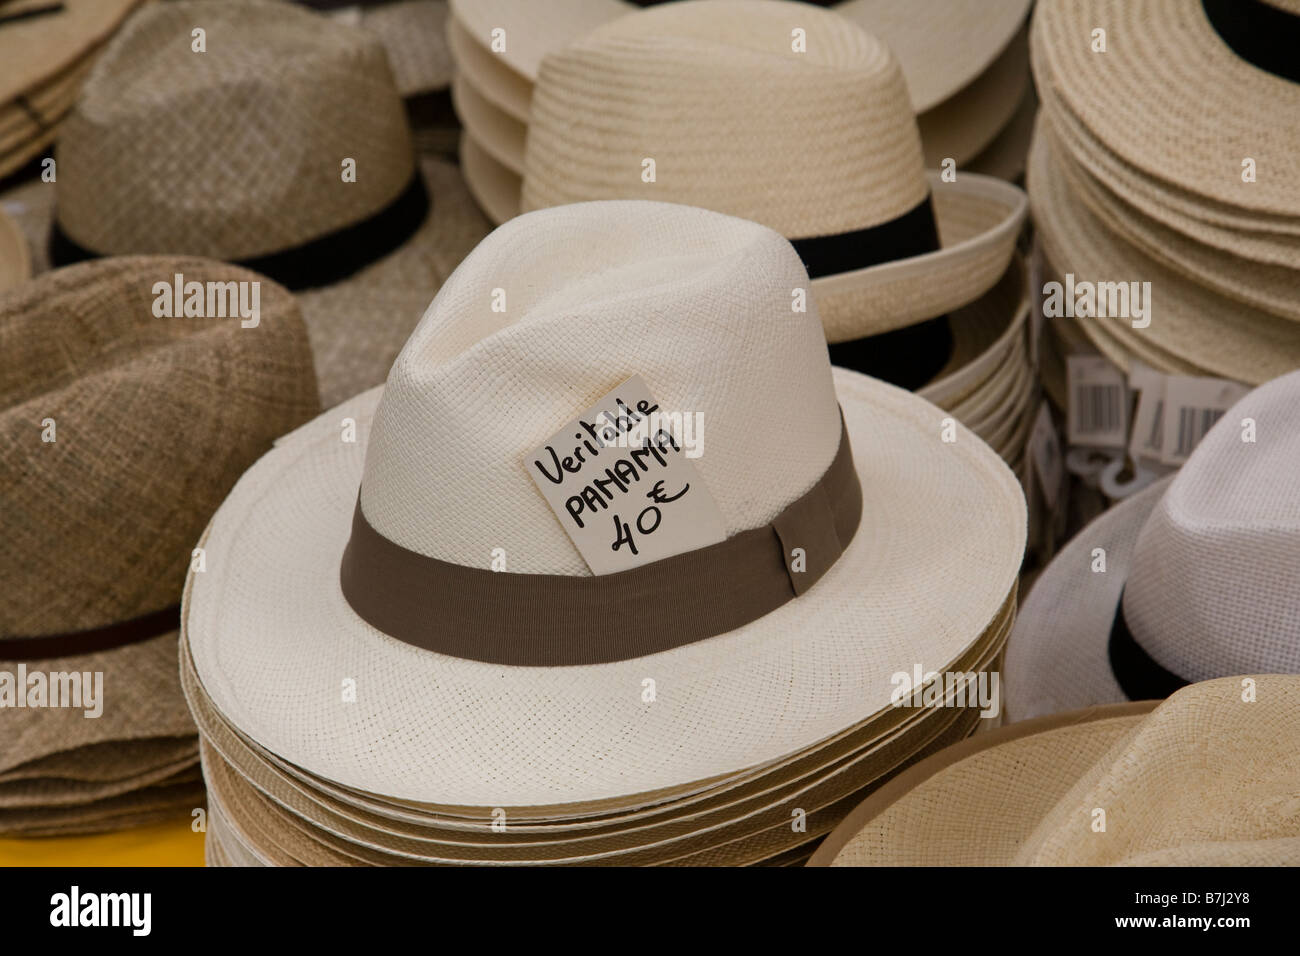 Panama Hats Market Stall Immagini   Panama Hats Market Stall Fotos ... eb8ee29e6107